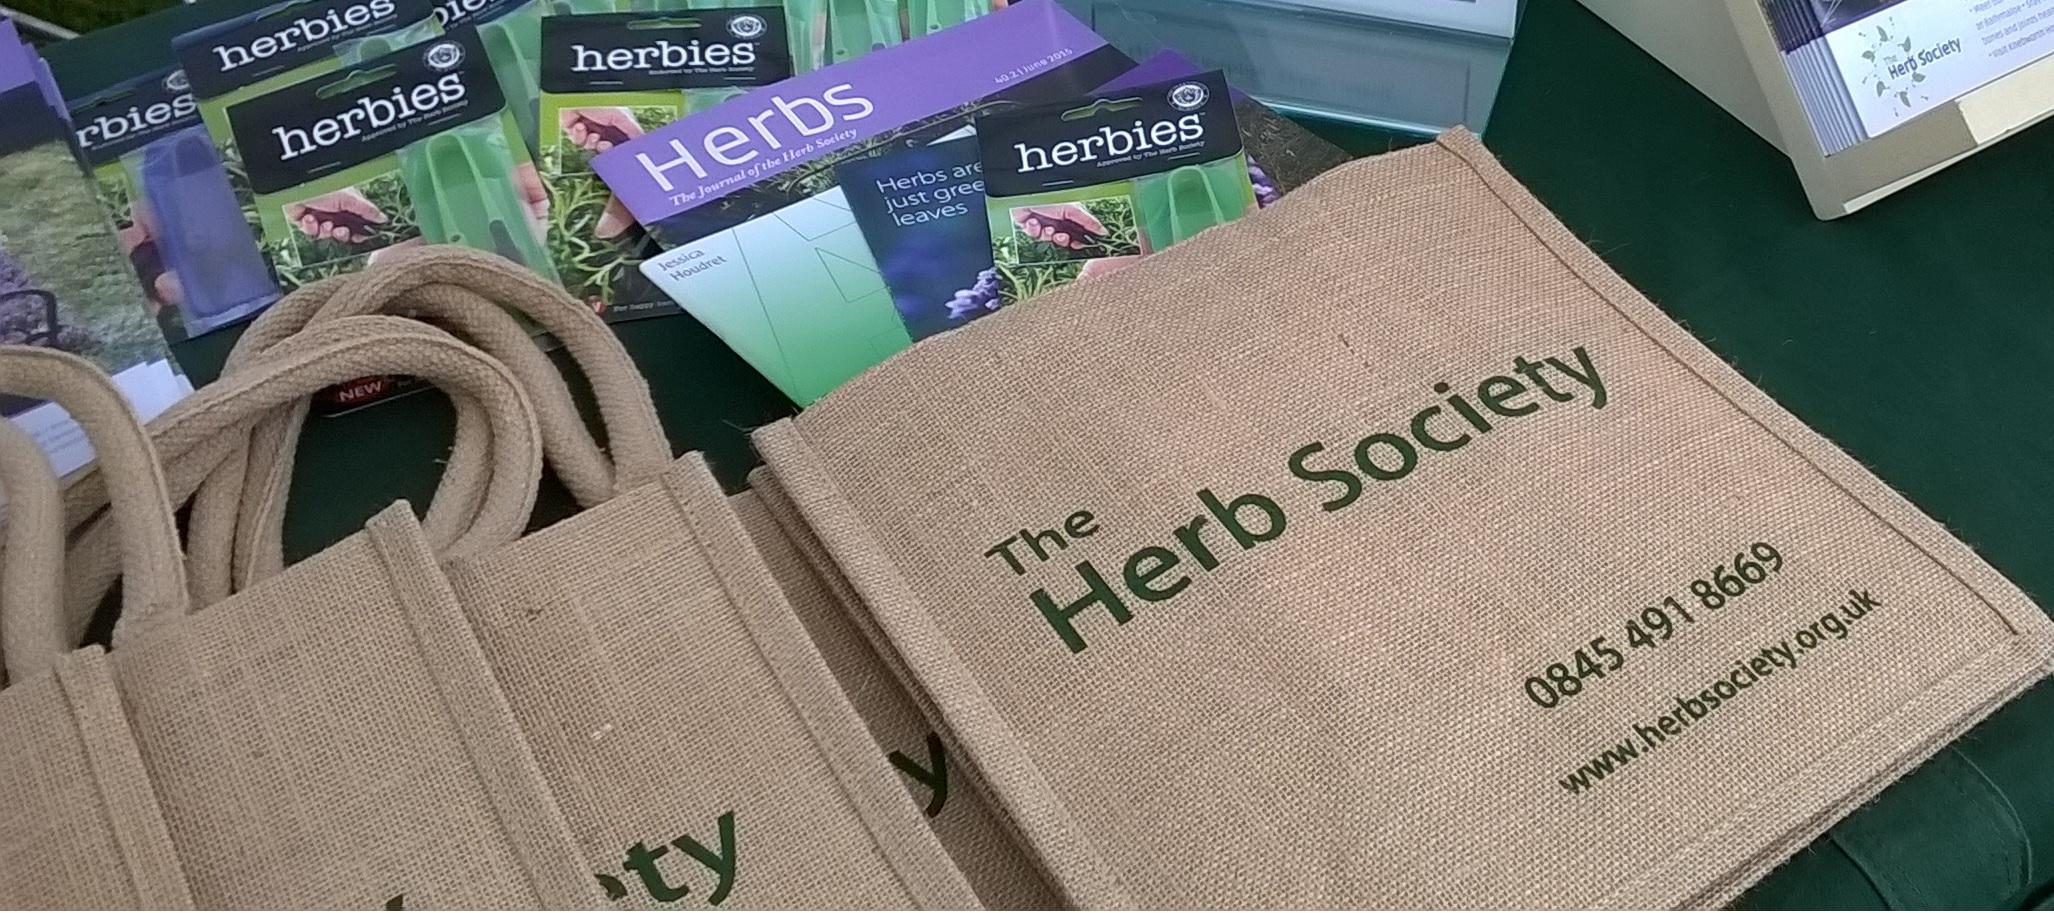 herb society membership pack